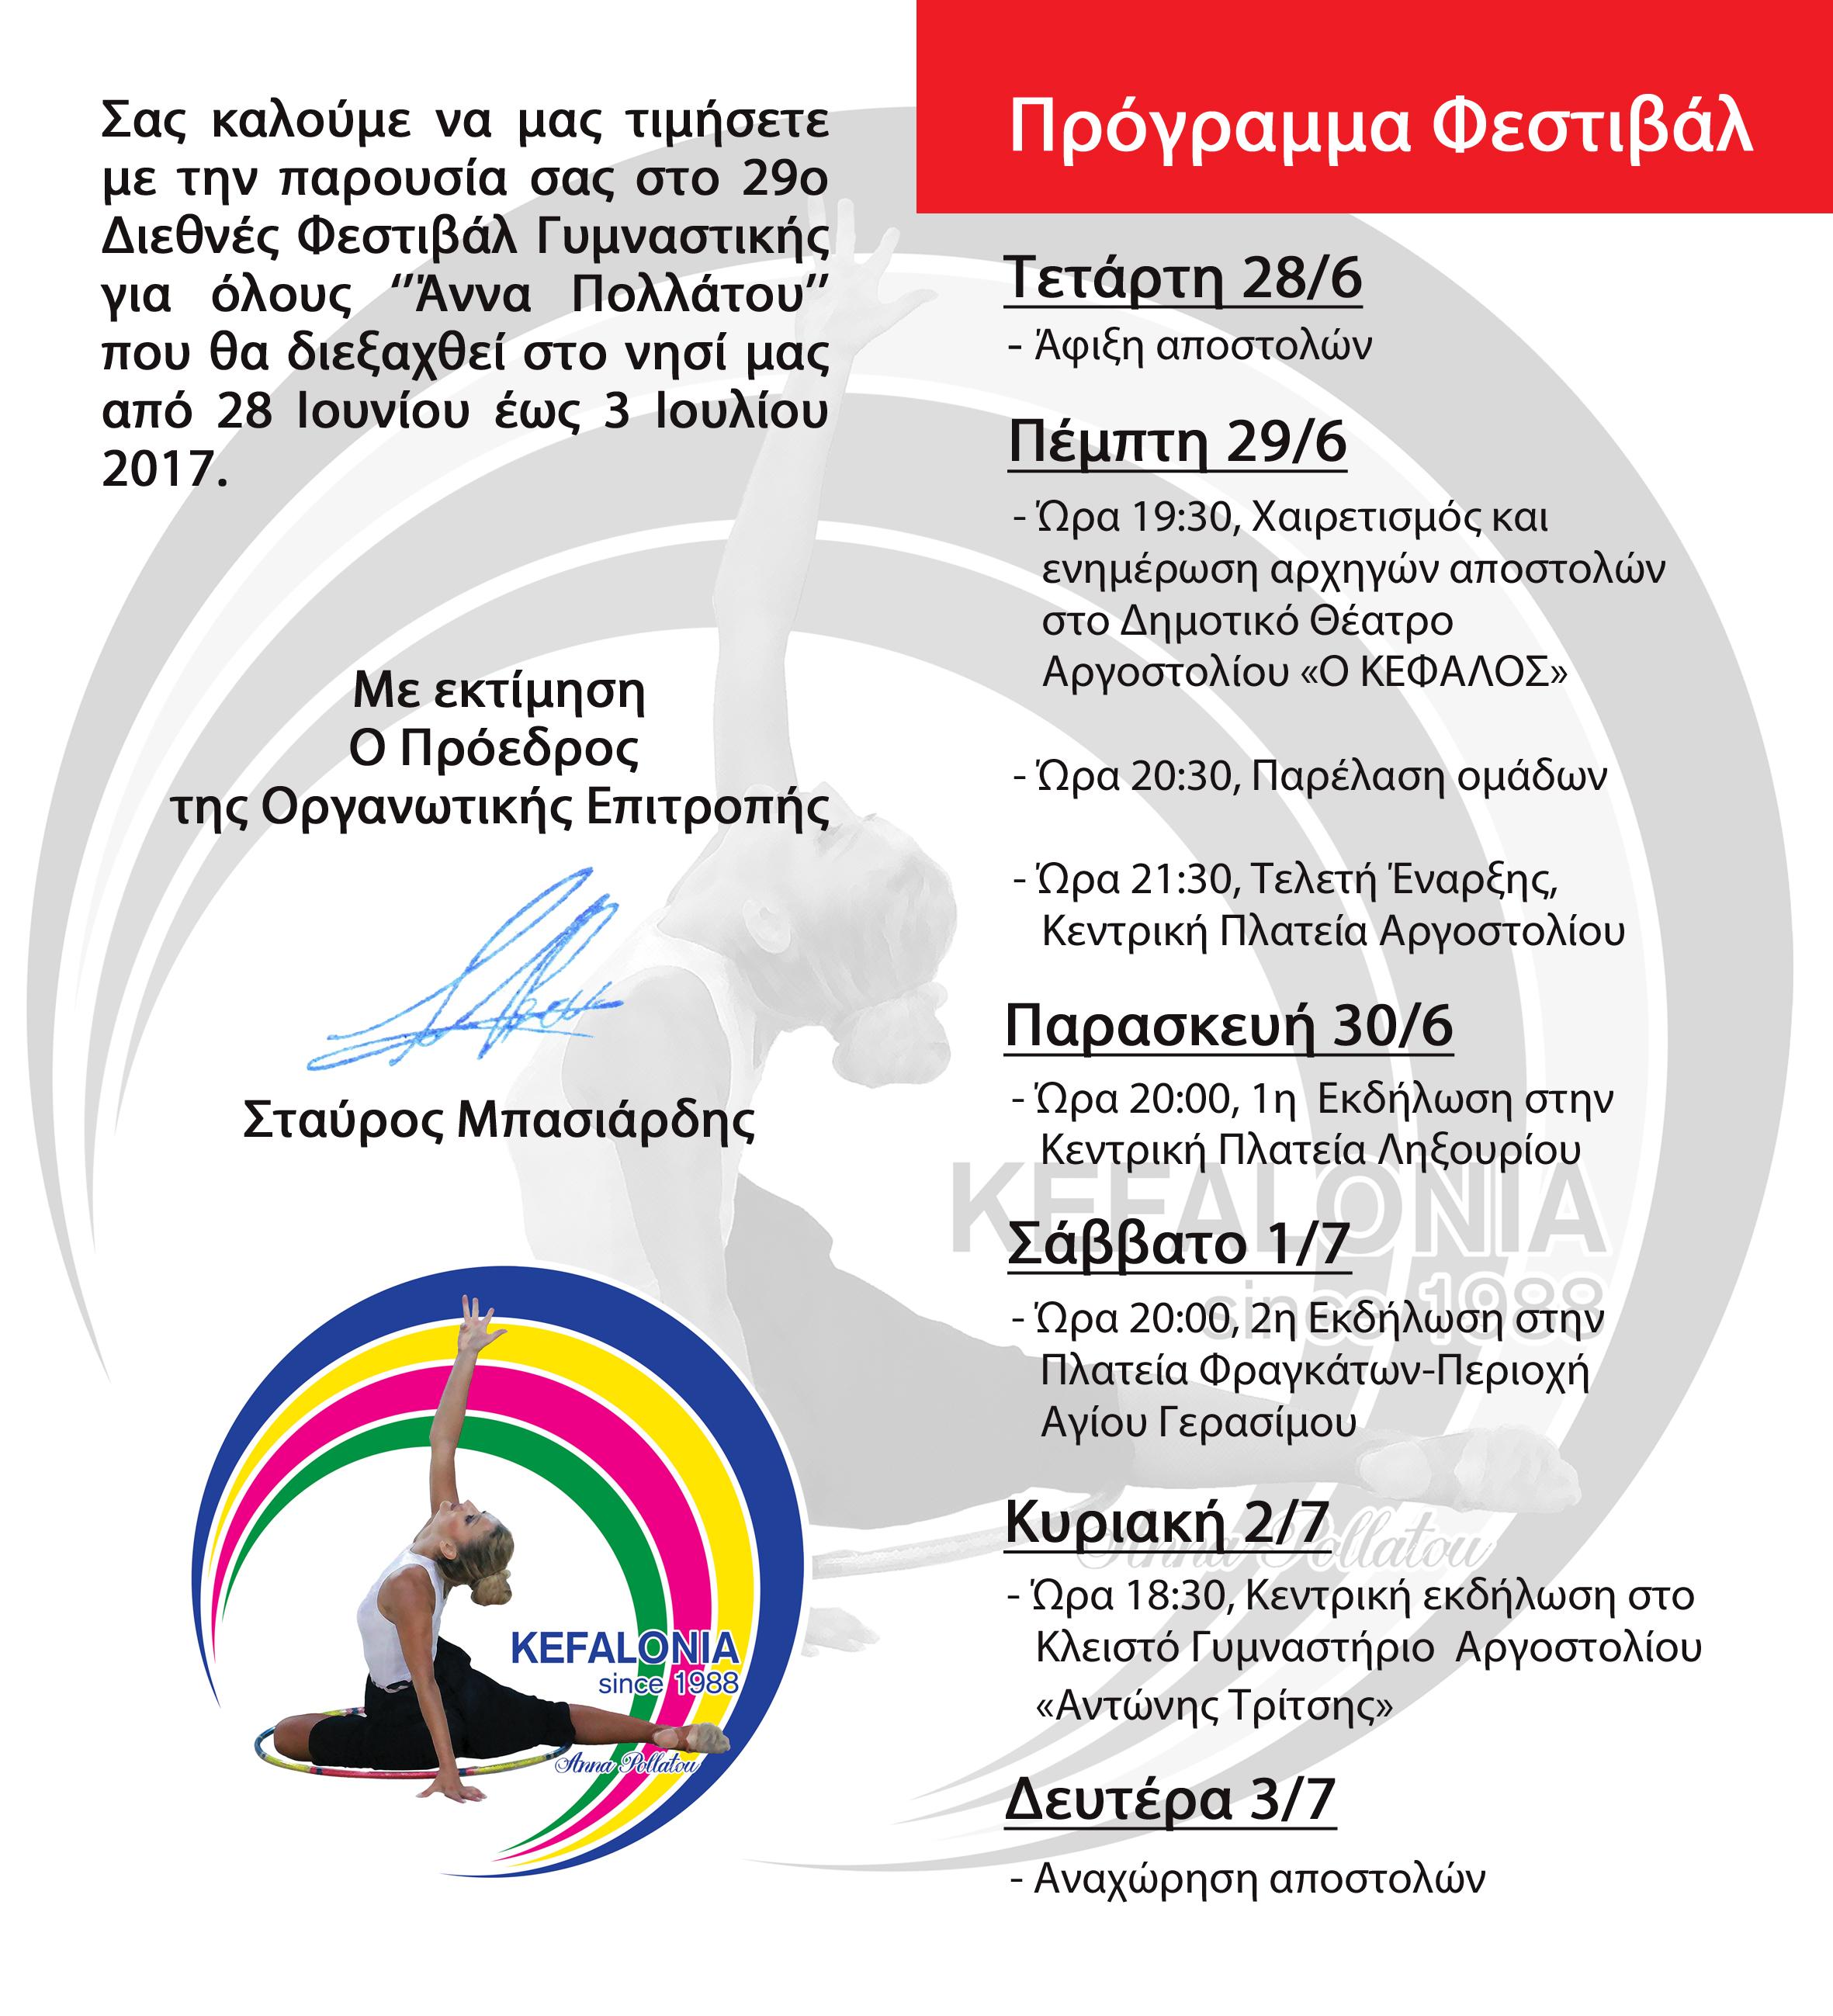 kefalonia_2017-prosklisi